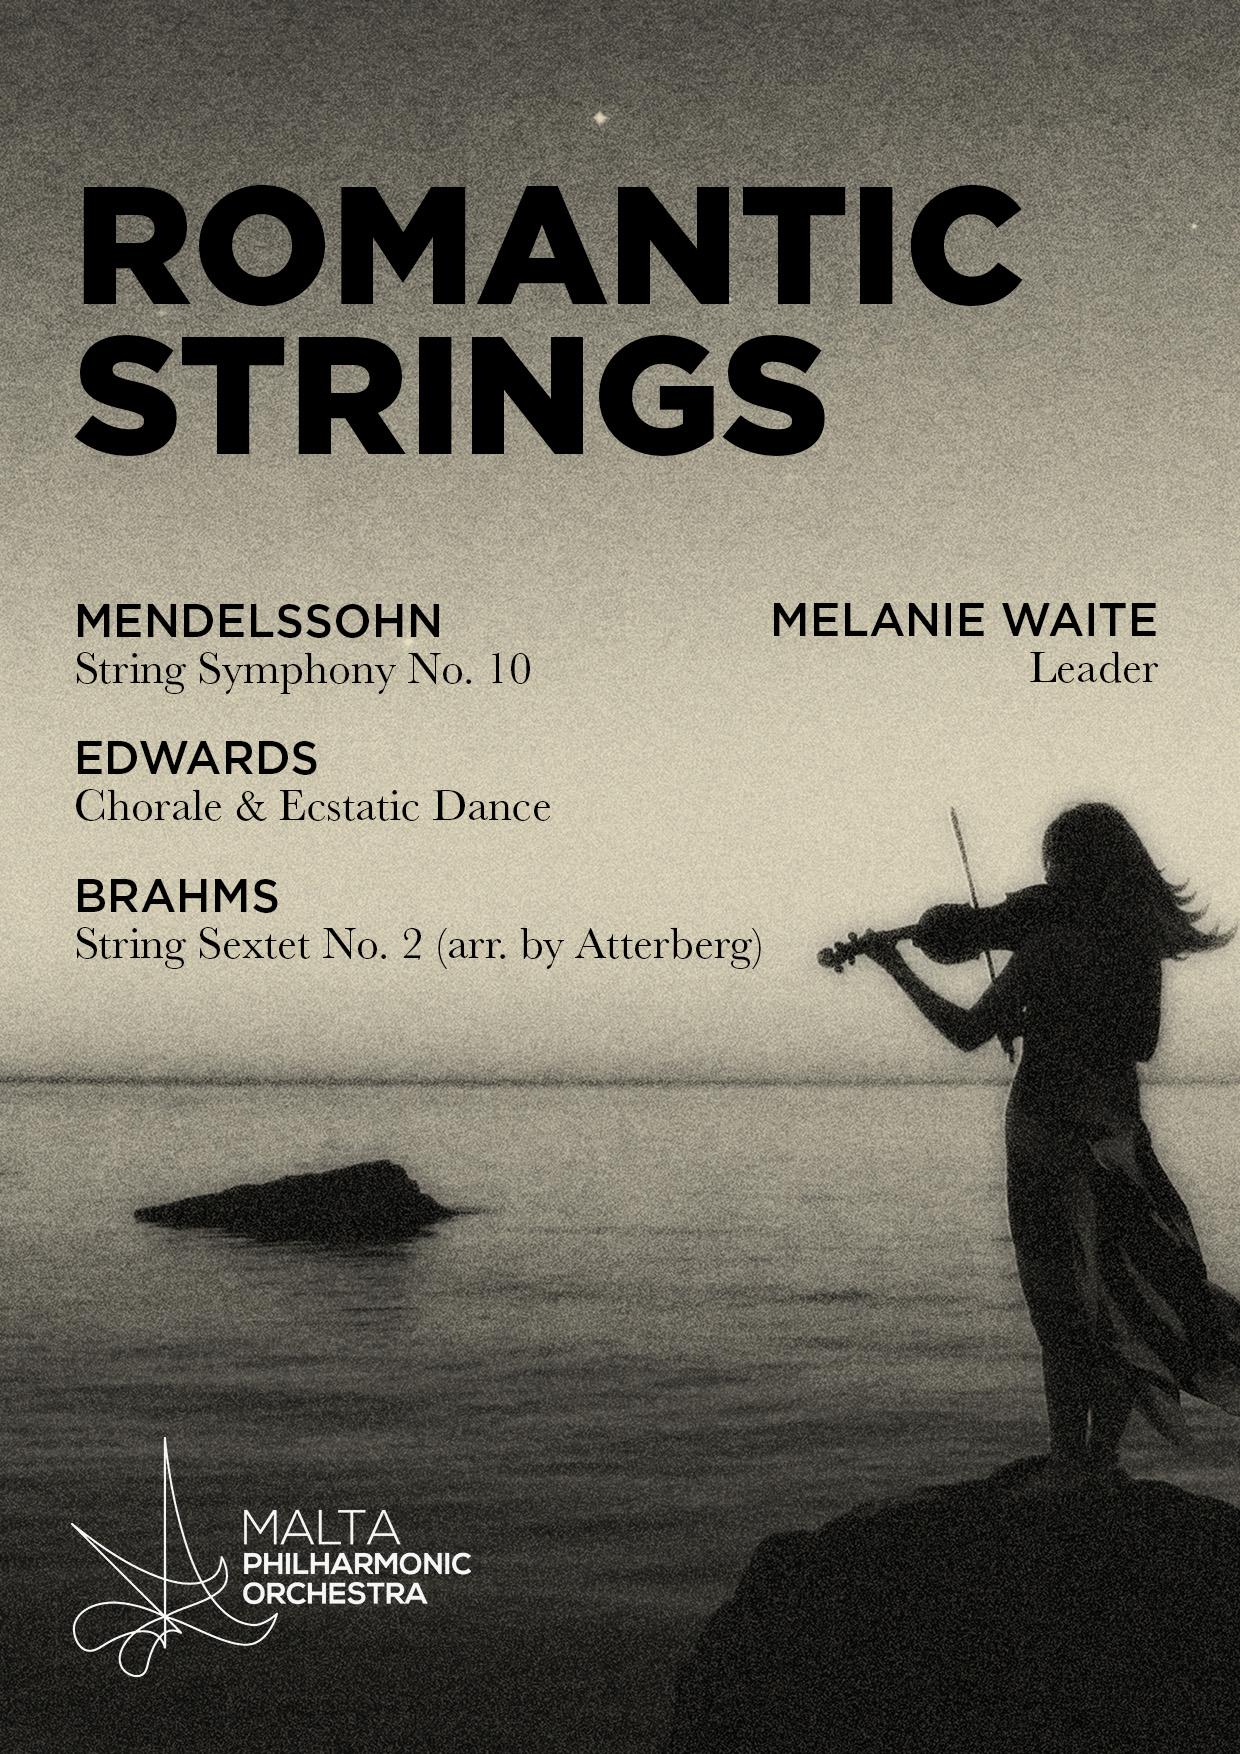 Romantic Strings flyer